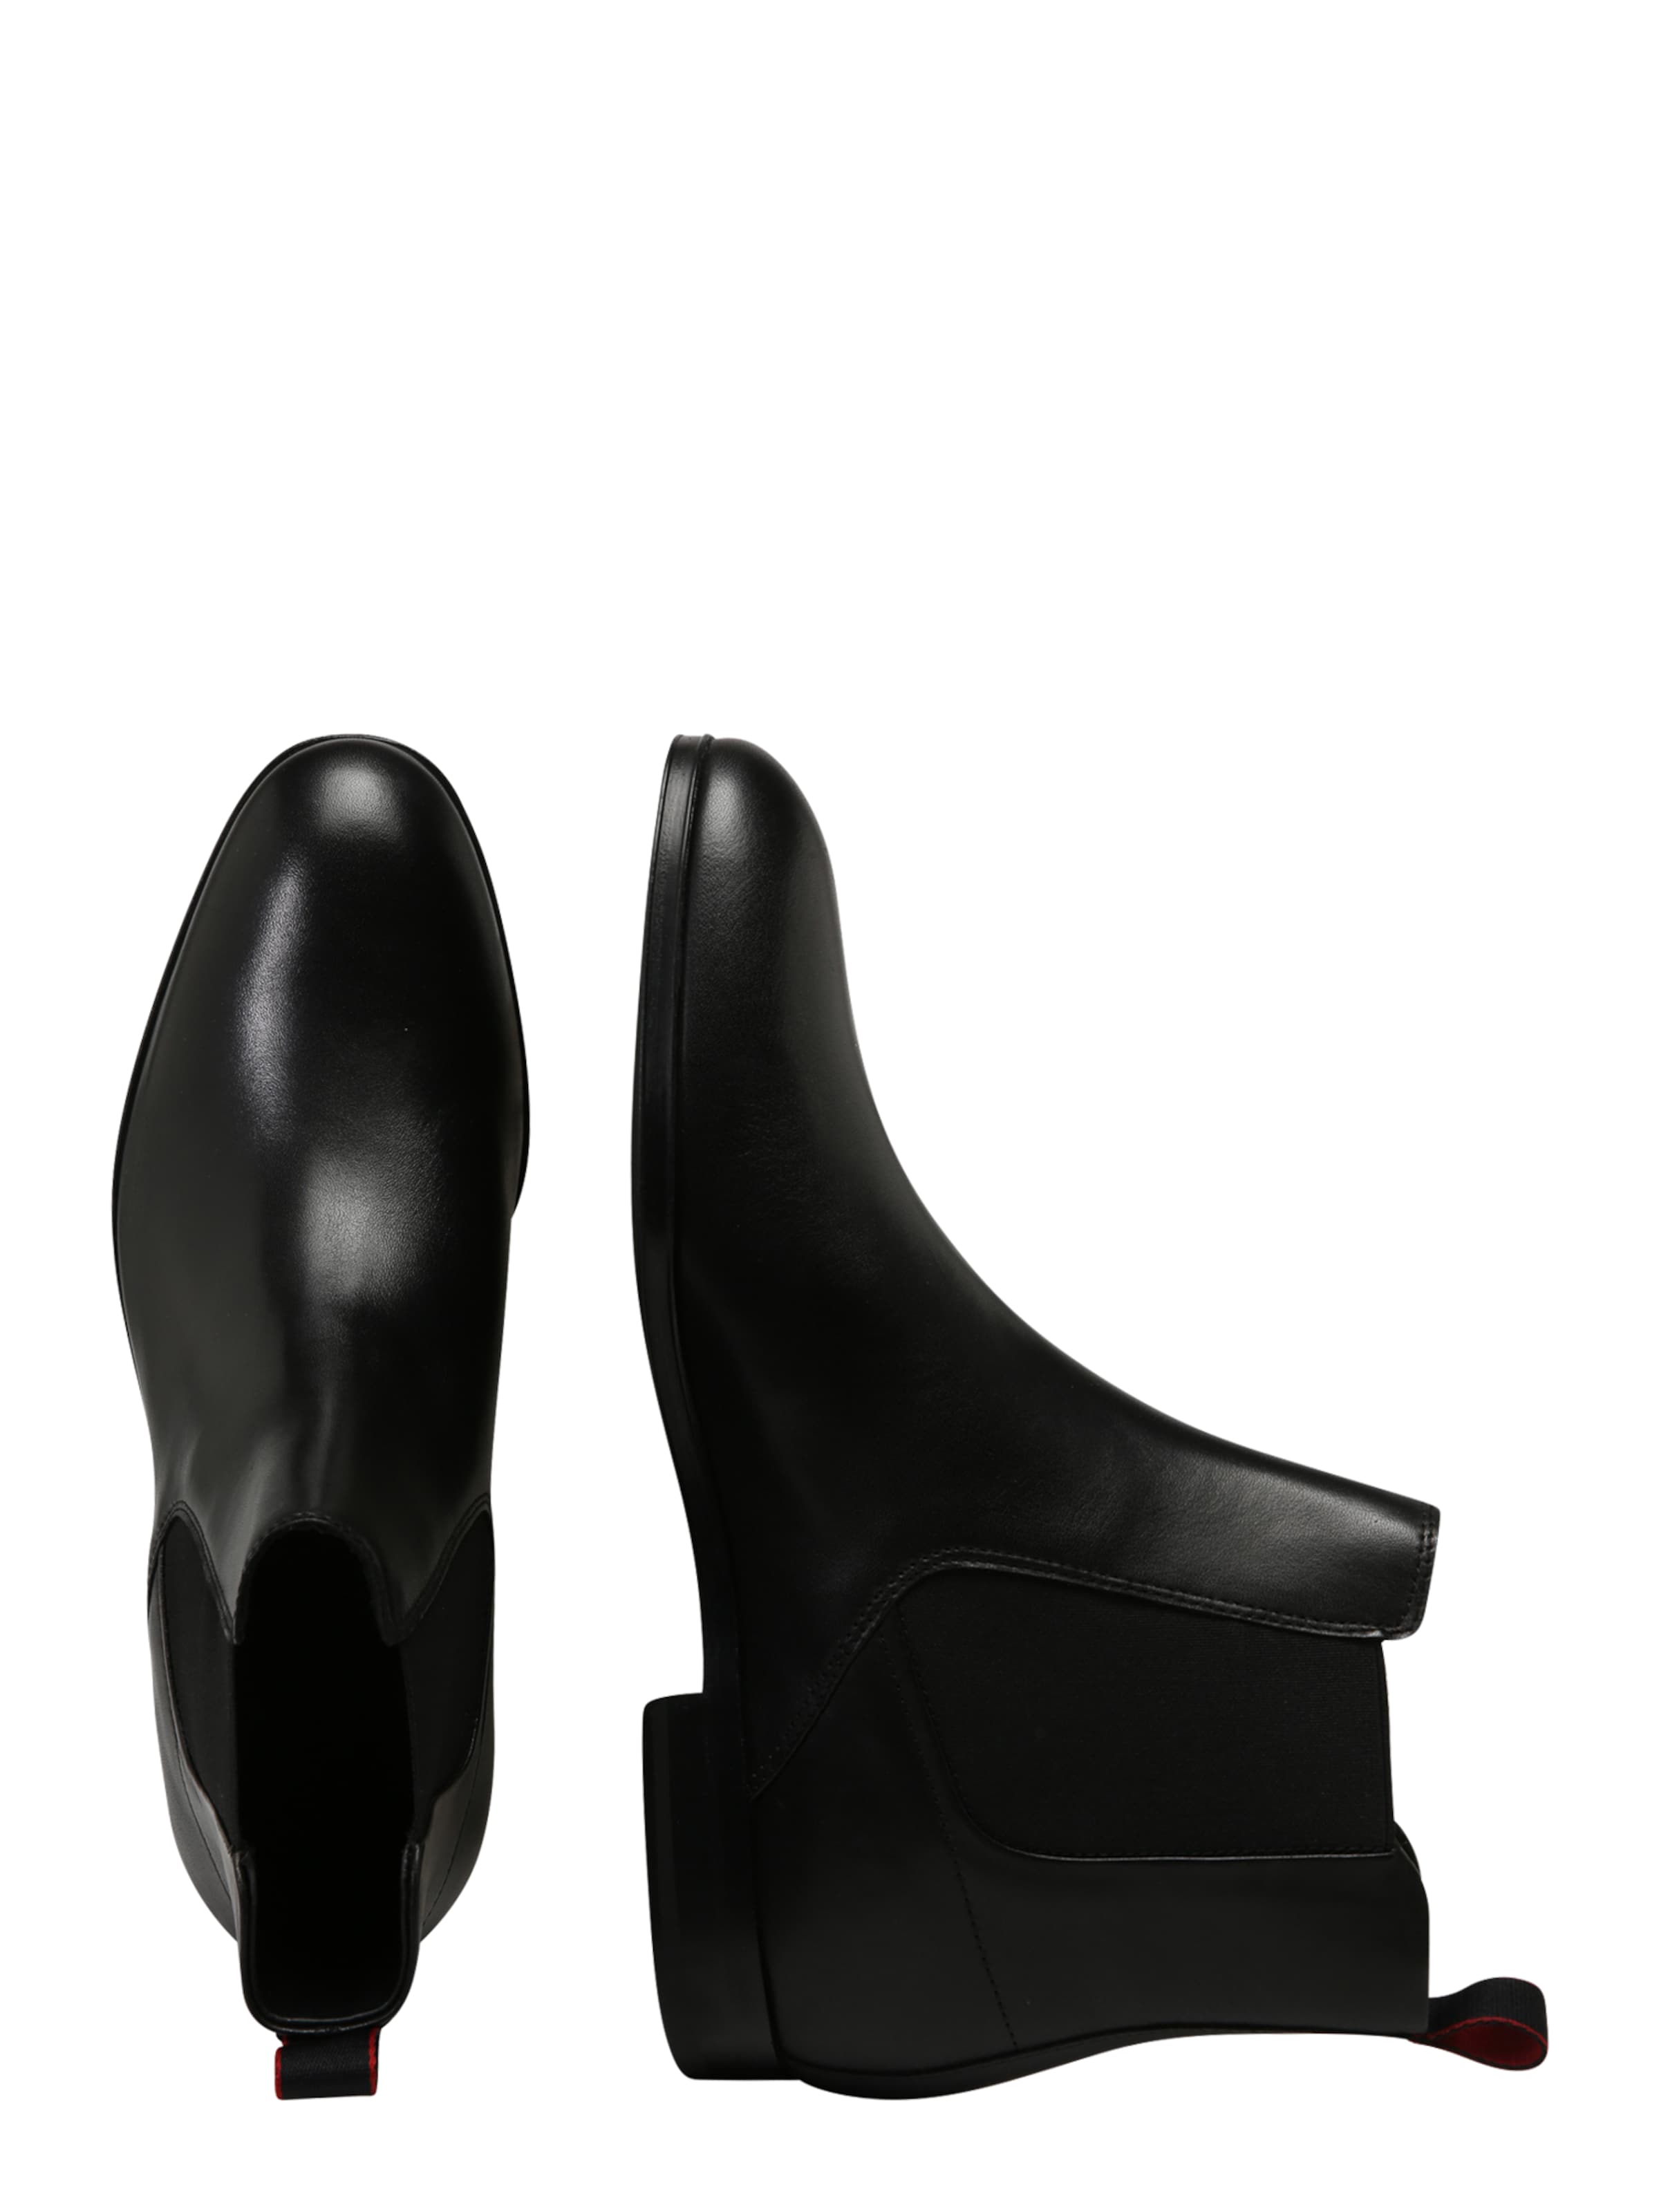 En Noir Cheb' Chelsea Hugo 'boheme Boots mnvN8w0